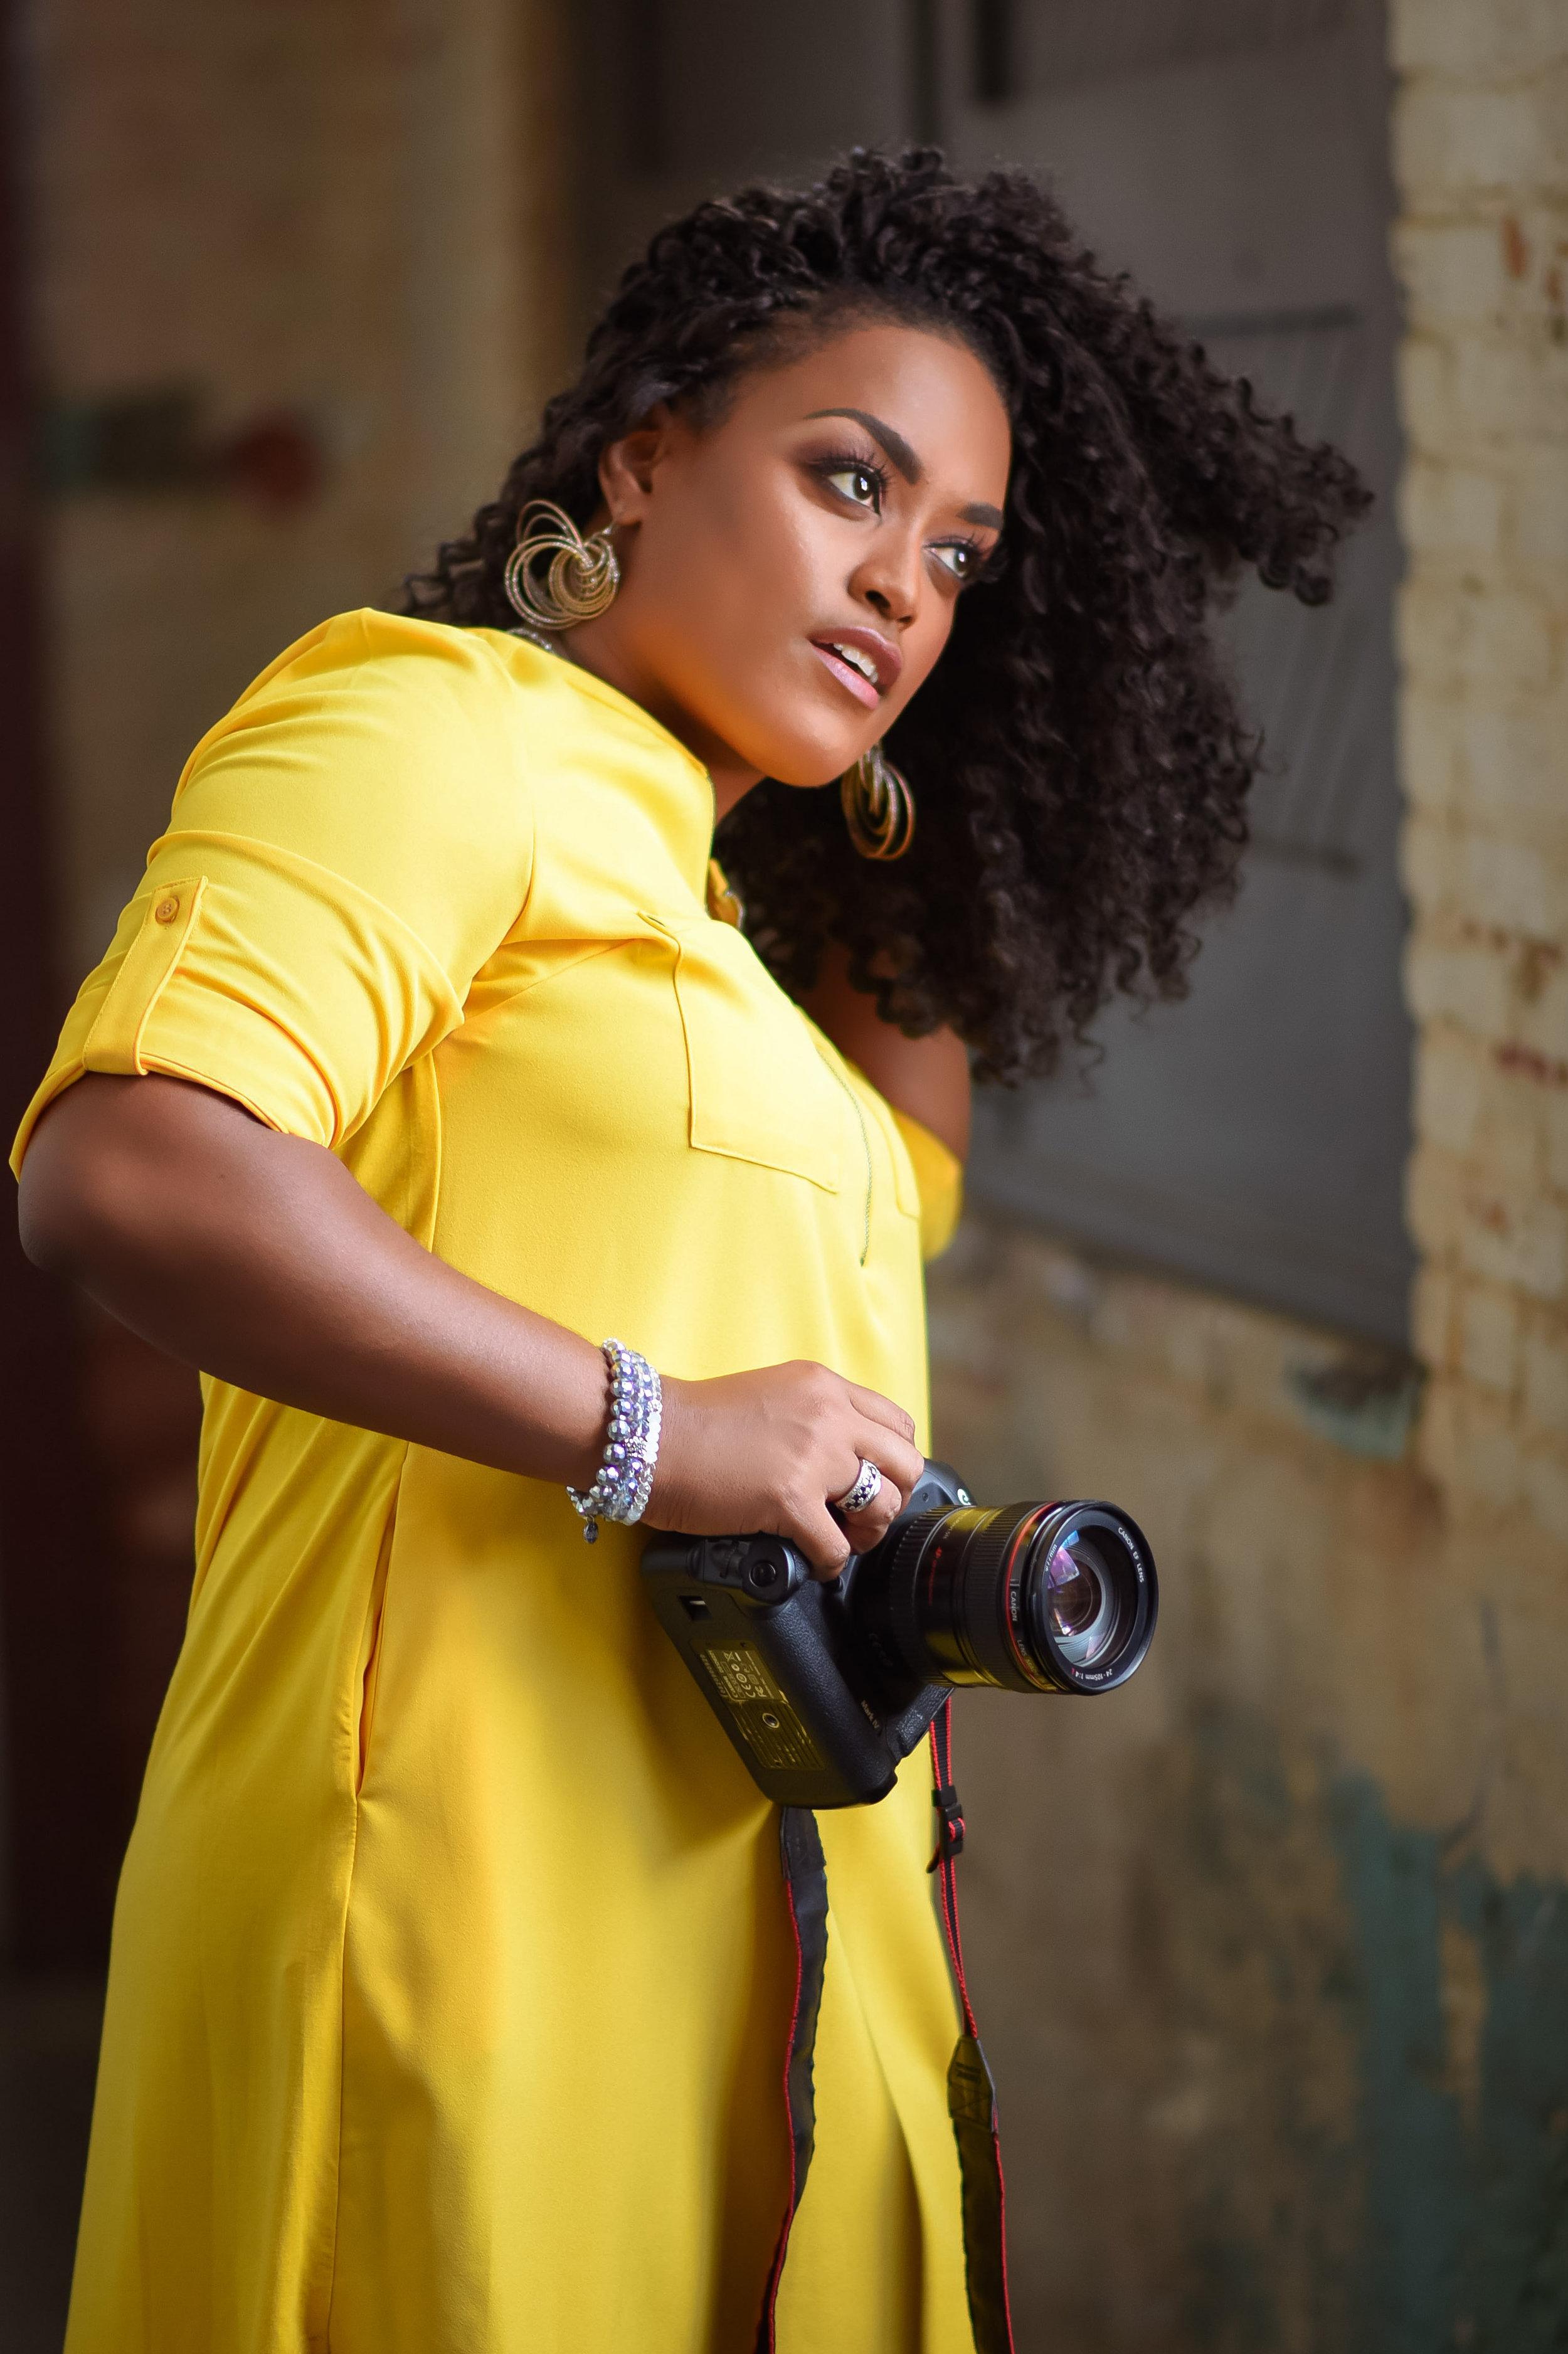 Marlo D. / Photographer -